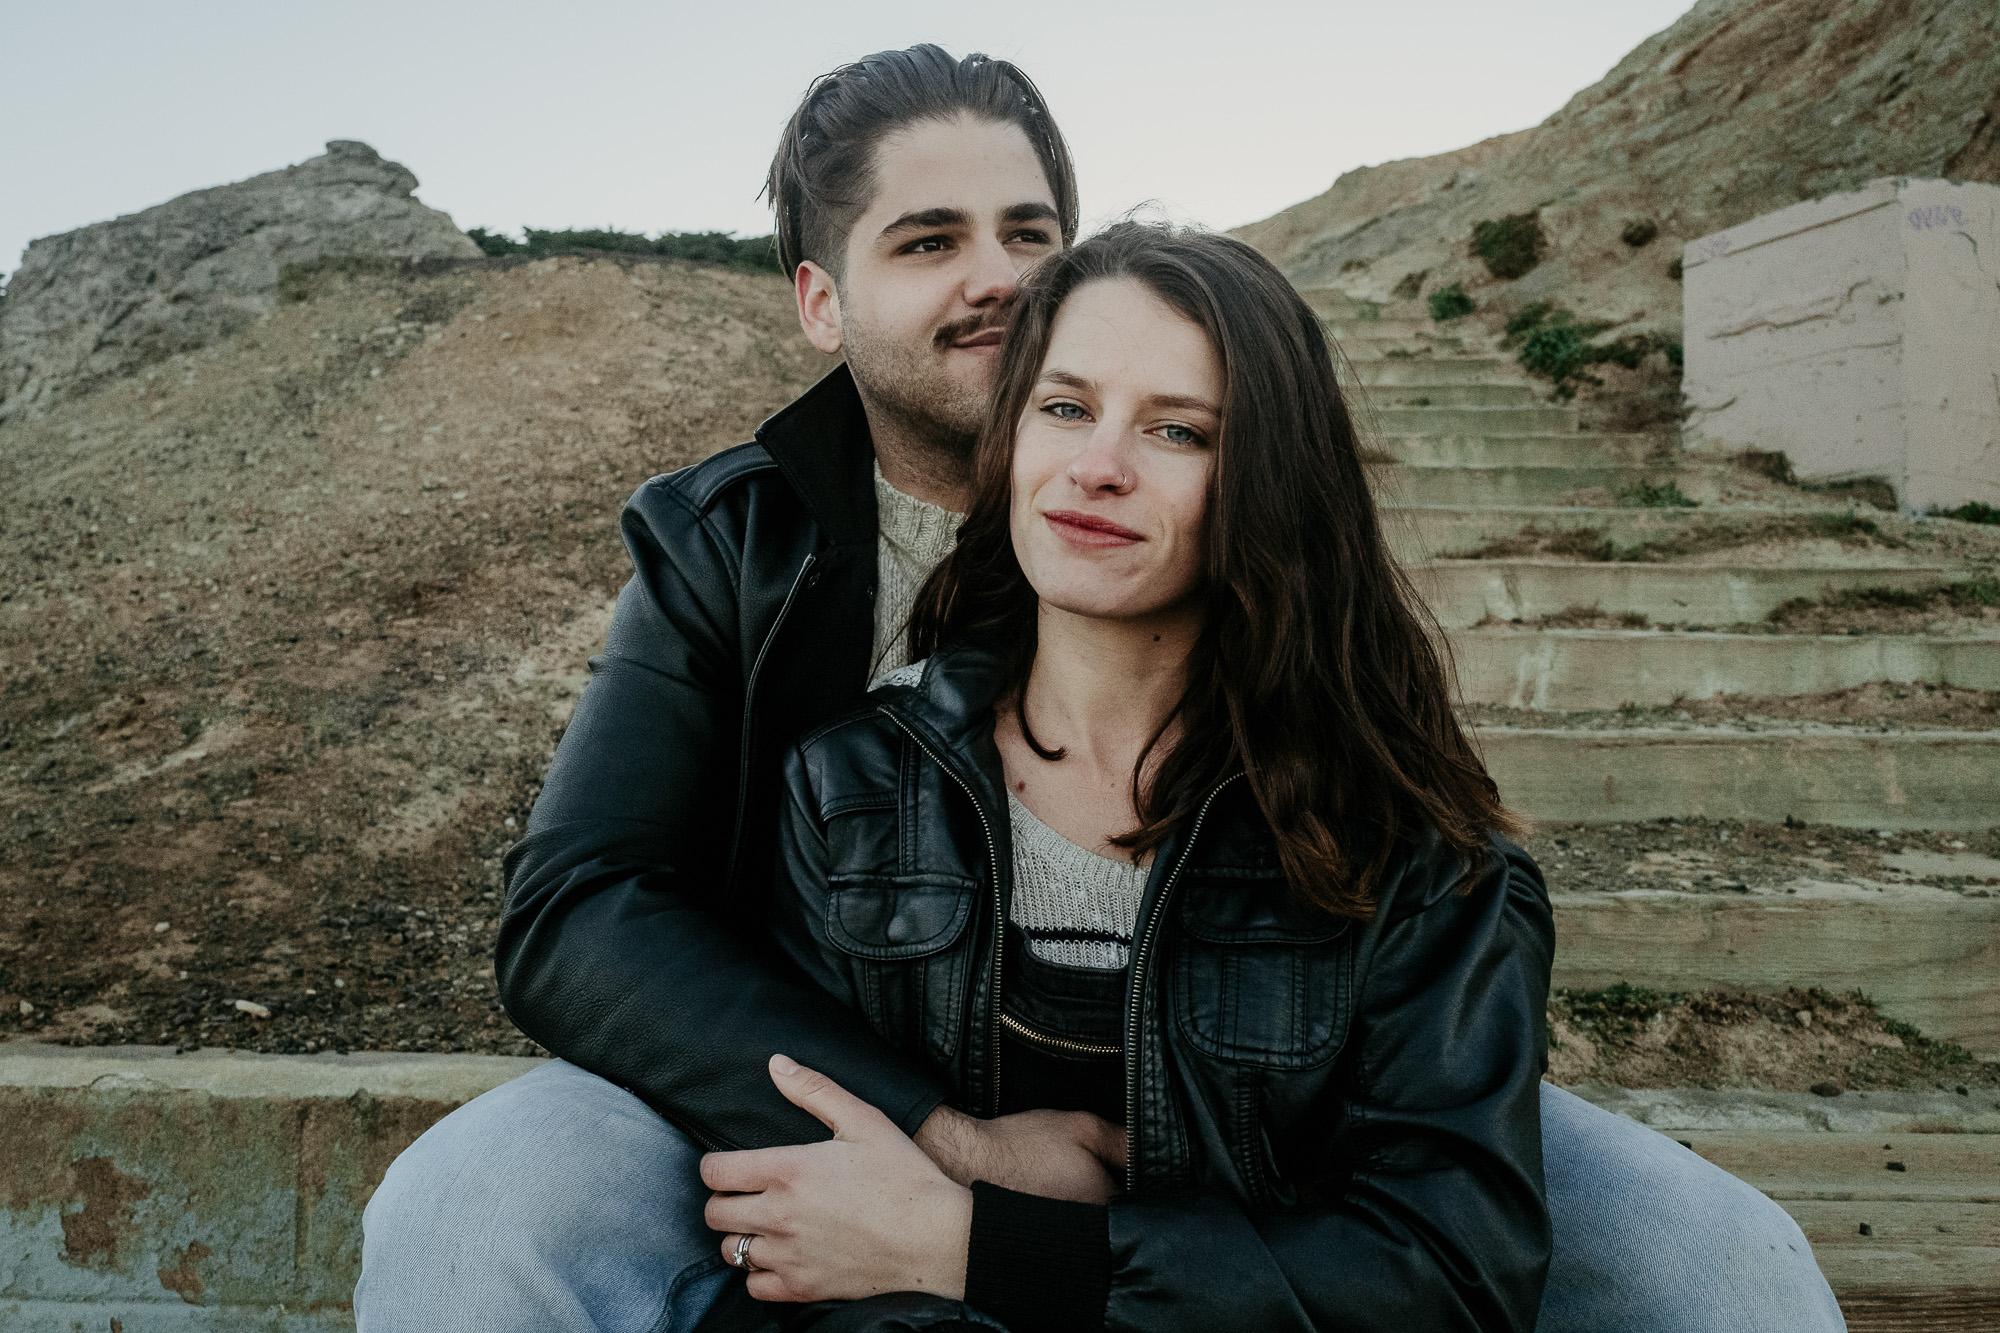 Rena + Felipe